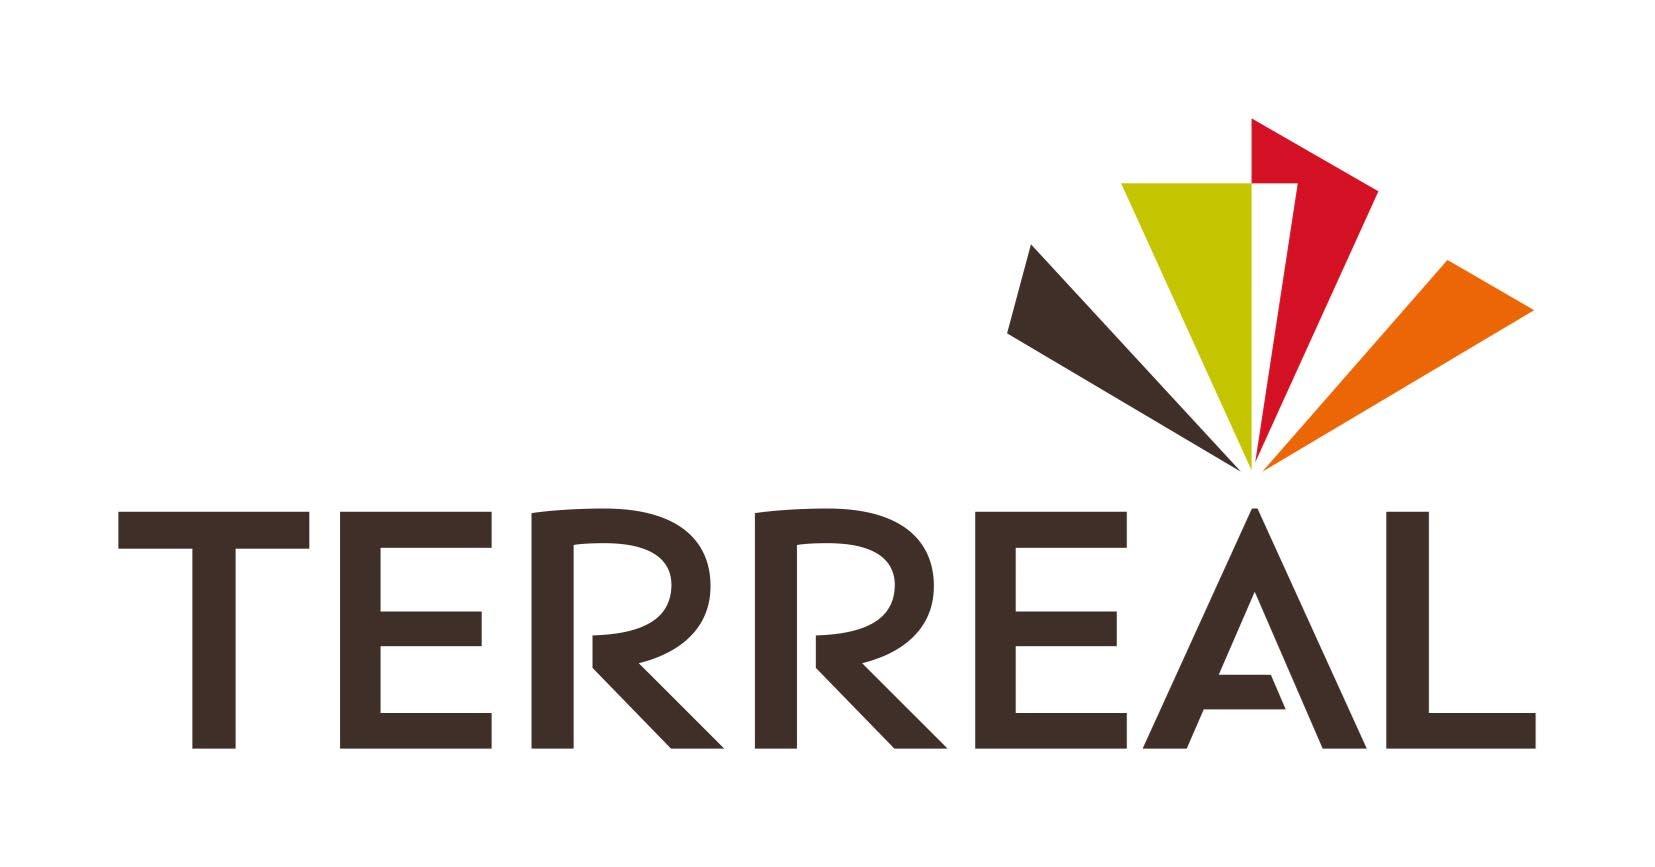 Logo terreal fond blanc - Matériaux de construction